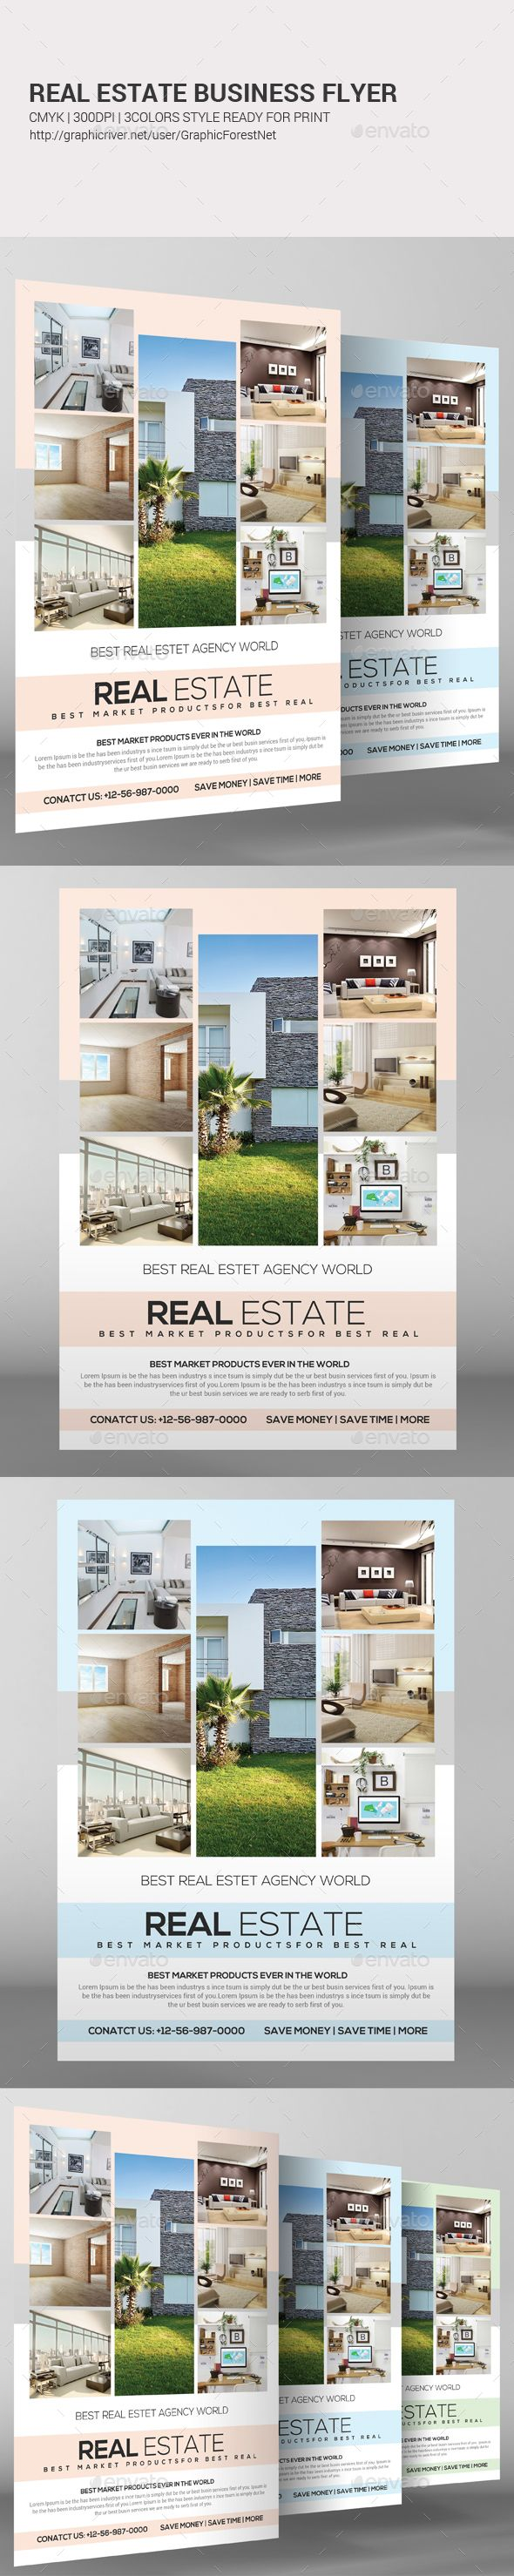 Nett Immobilien Open House Flyer Vorlage Bilder - FORTSETZUNG ...